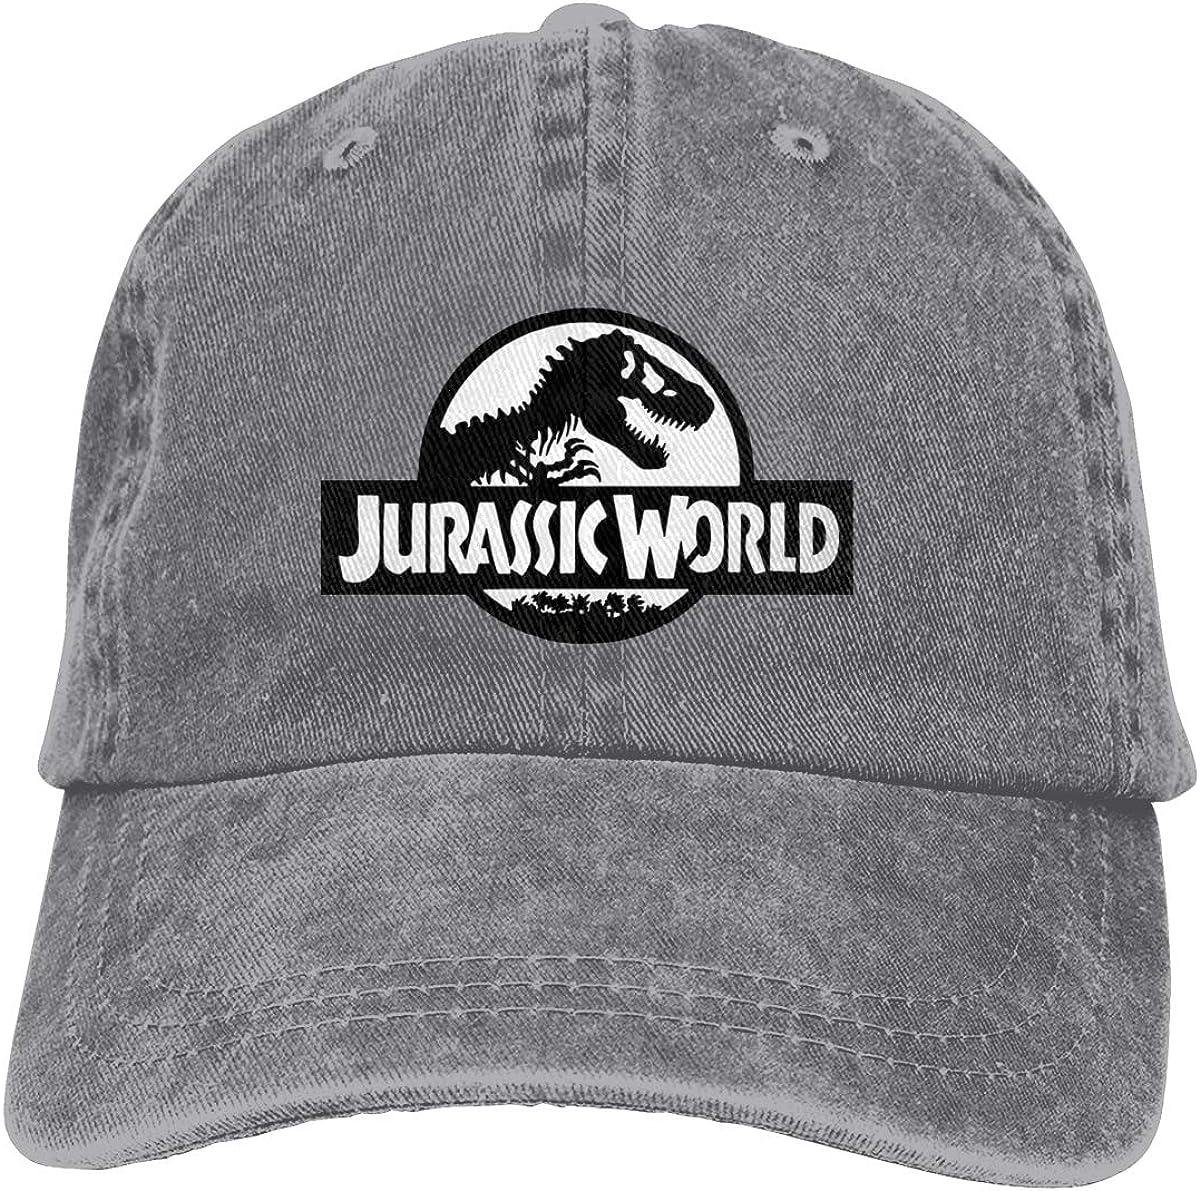 LeoBird Jur_Assic World Logo Unisex Cotton 5% OFF Adju Award Cowboy Caps 100%